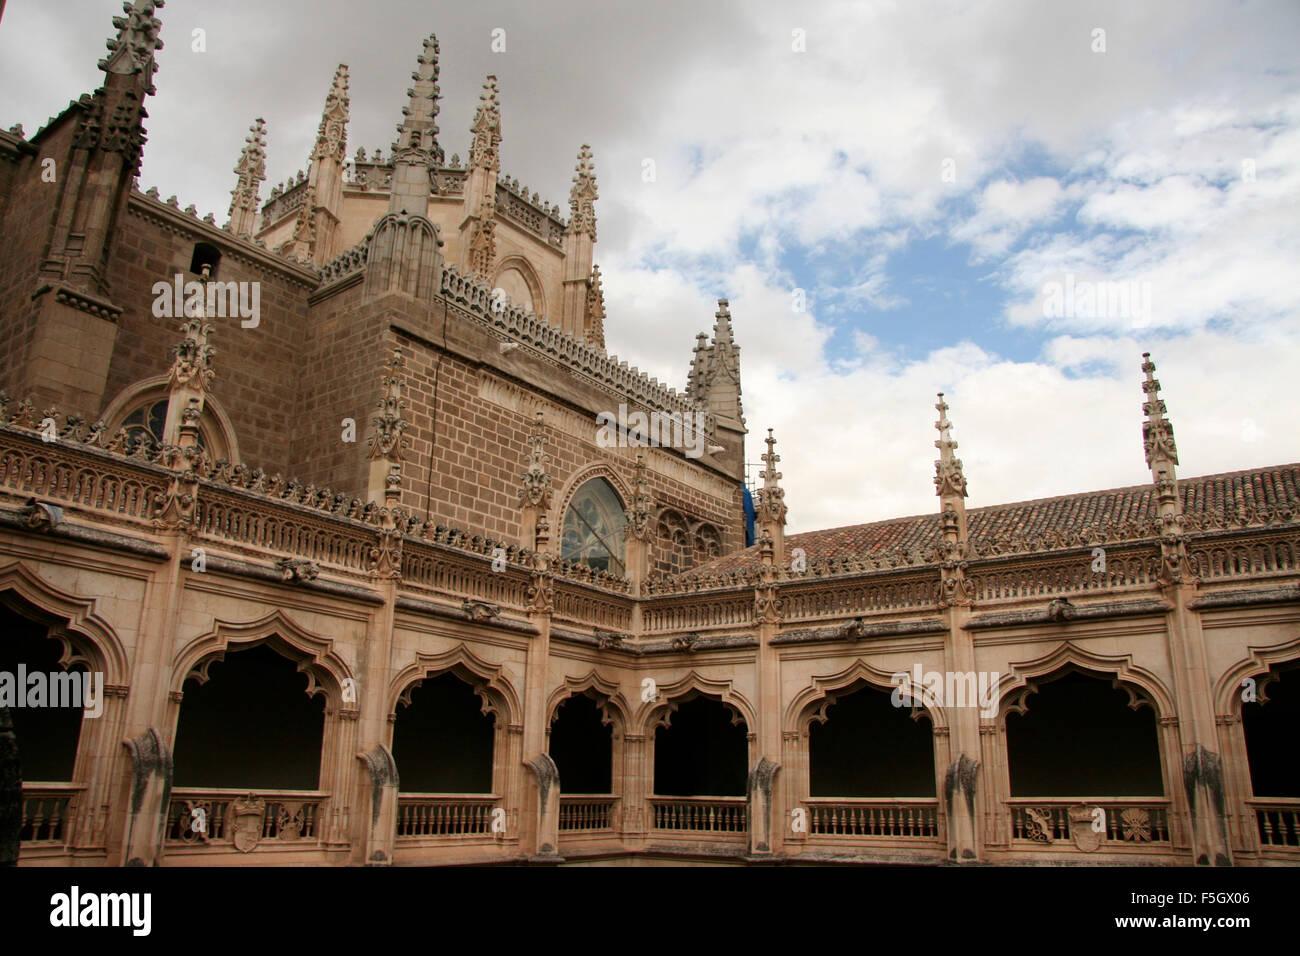 Gothic atrium of Monastery of Saint John of the Kings, Toledo, Spain - Stock Image